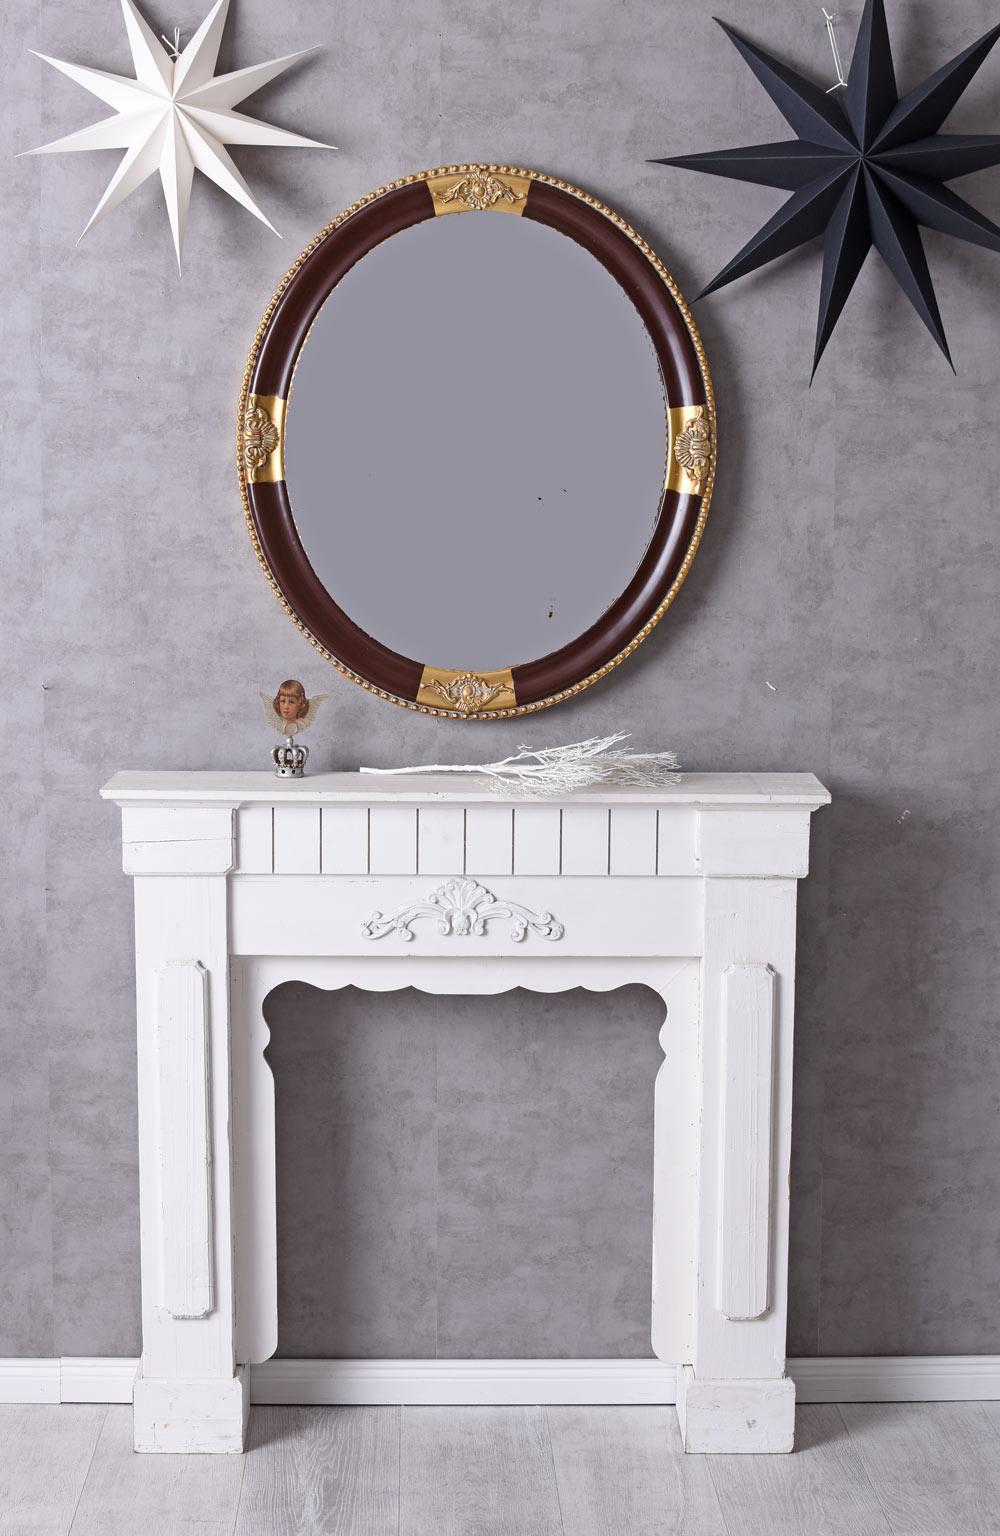 spiegel rund wandspiegel barock dekospiegel kaminspiegel